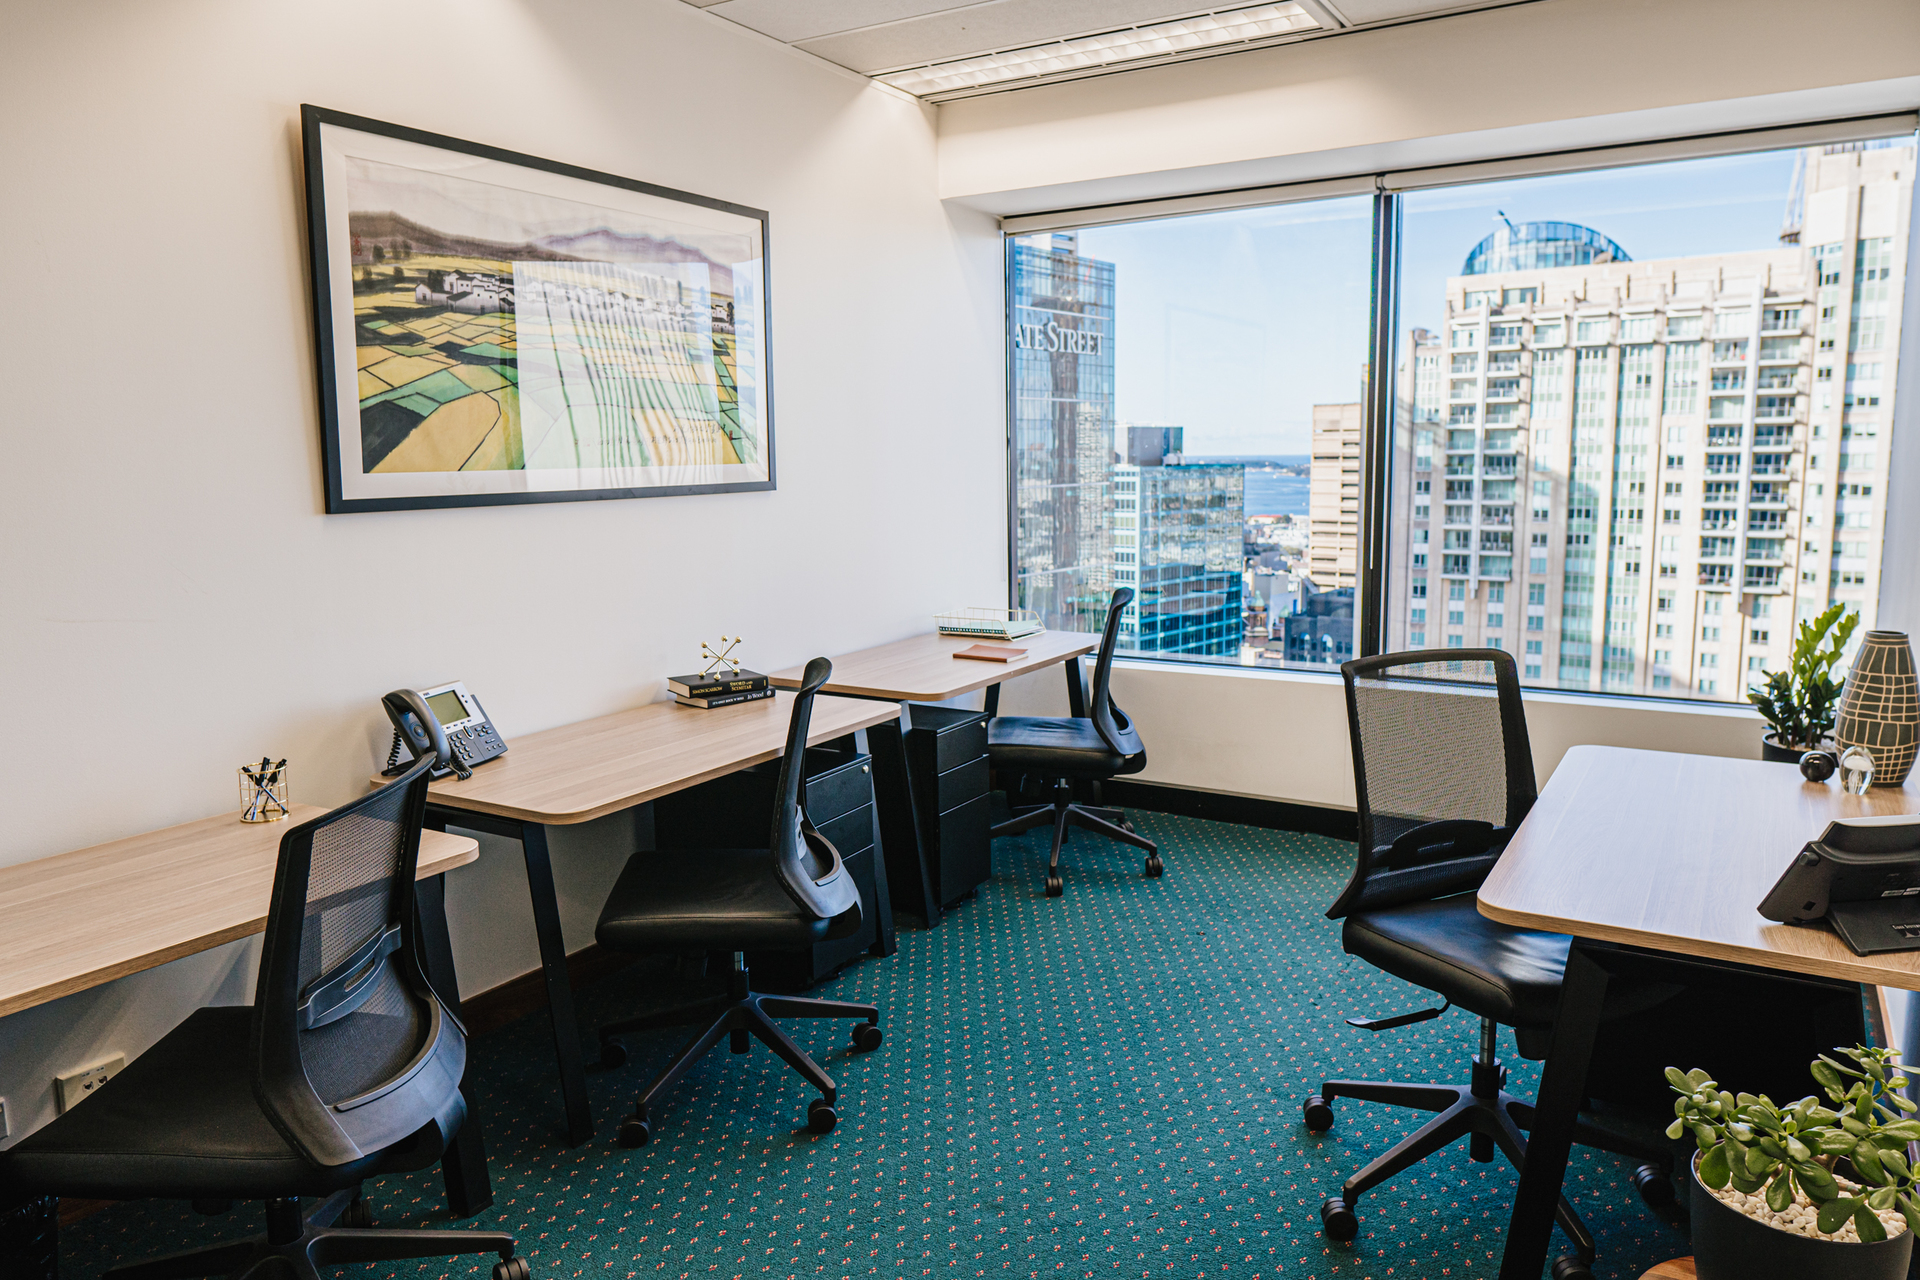 Modern 4 person private workspace in Sydney's CBD